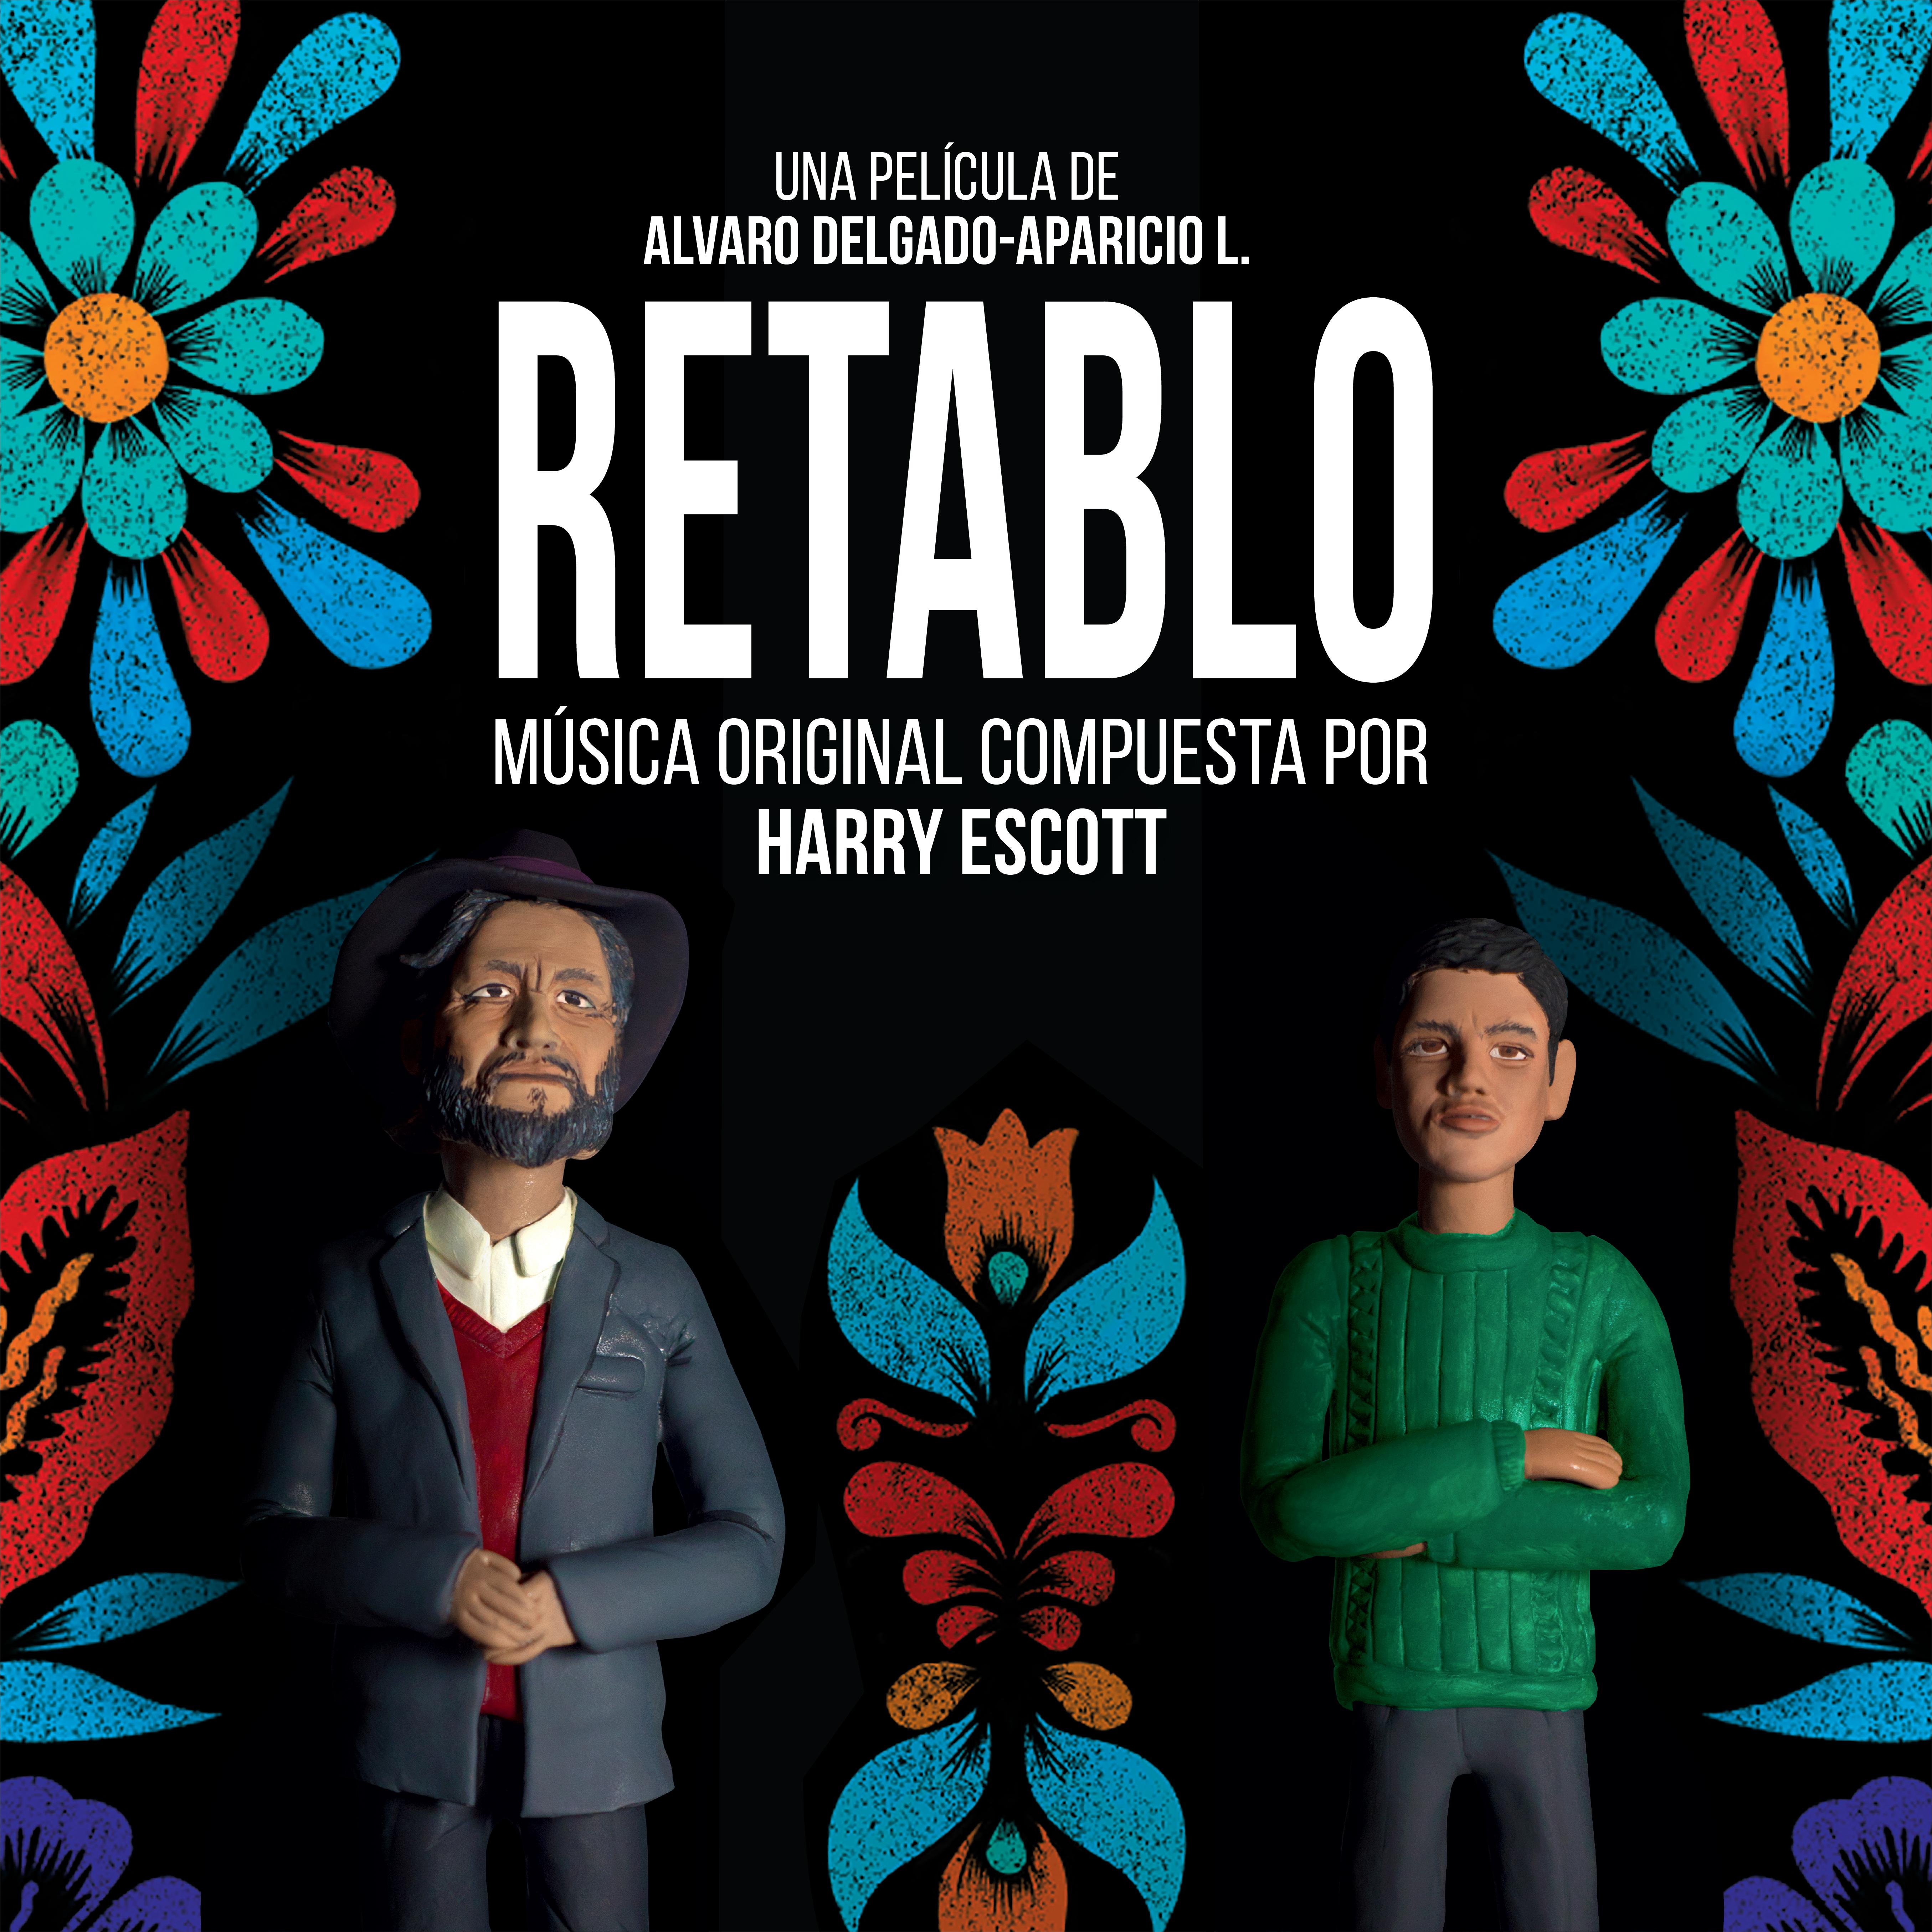 Manners McDade's Harry Escott Releases 'Retablo' Soundtrack